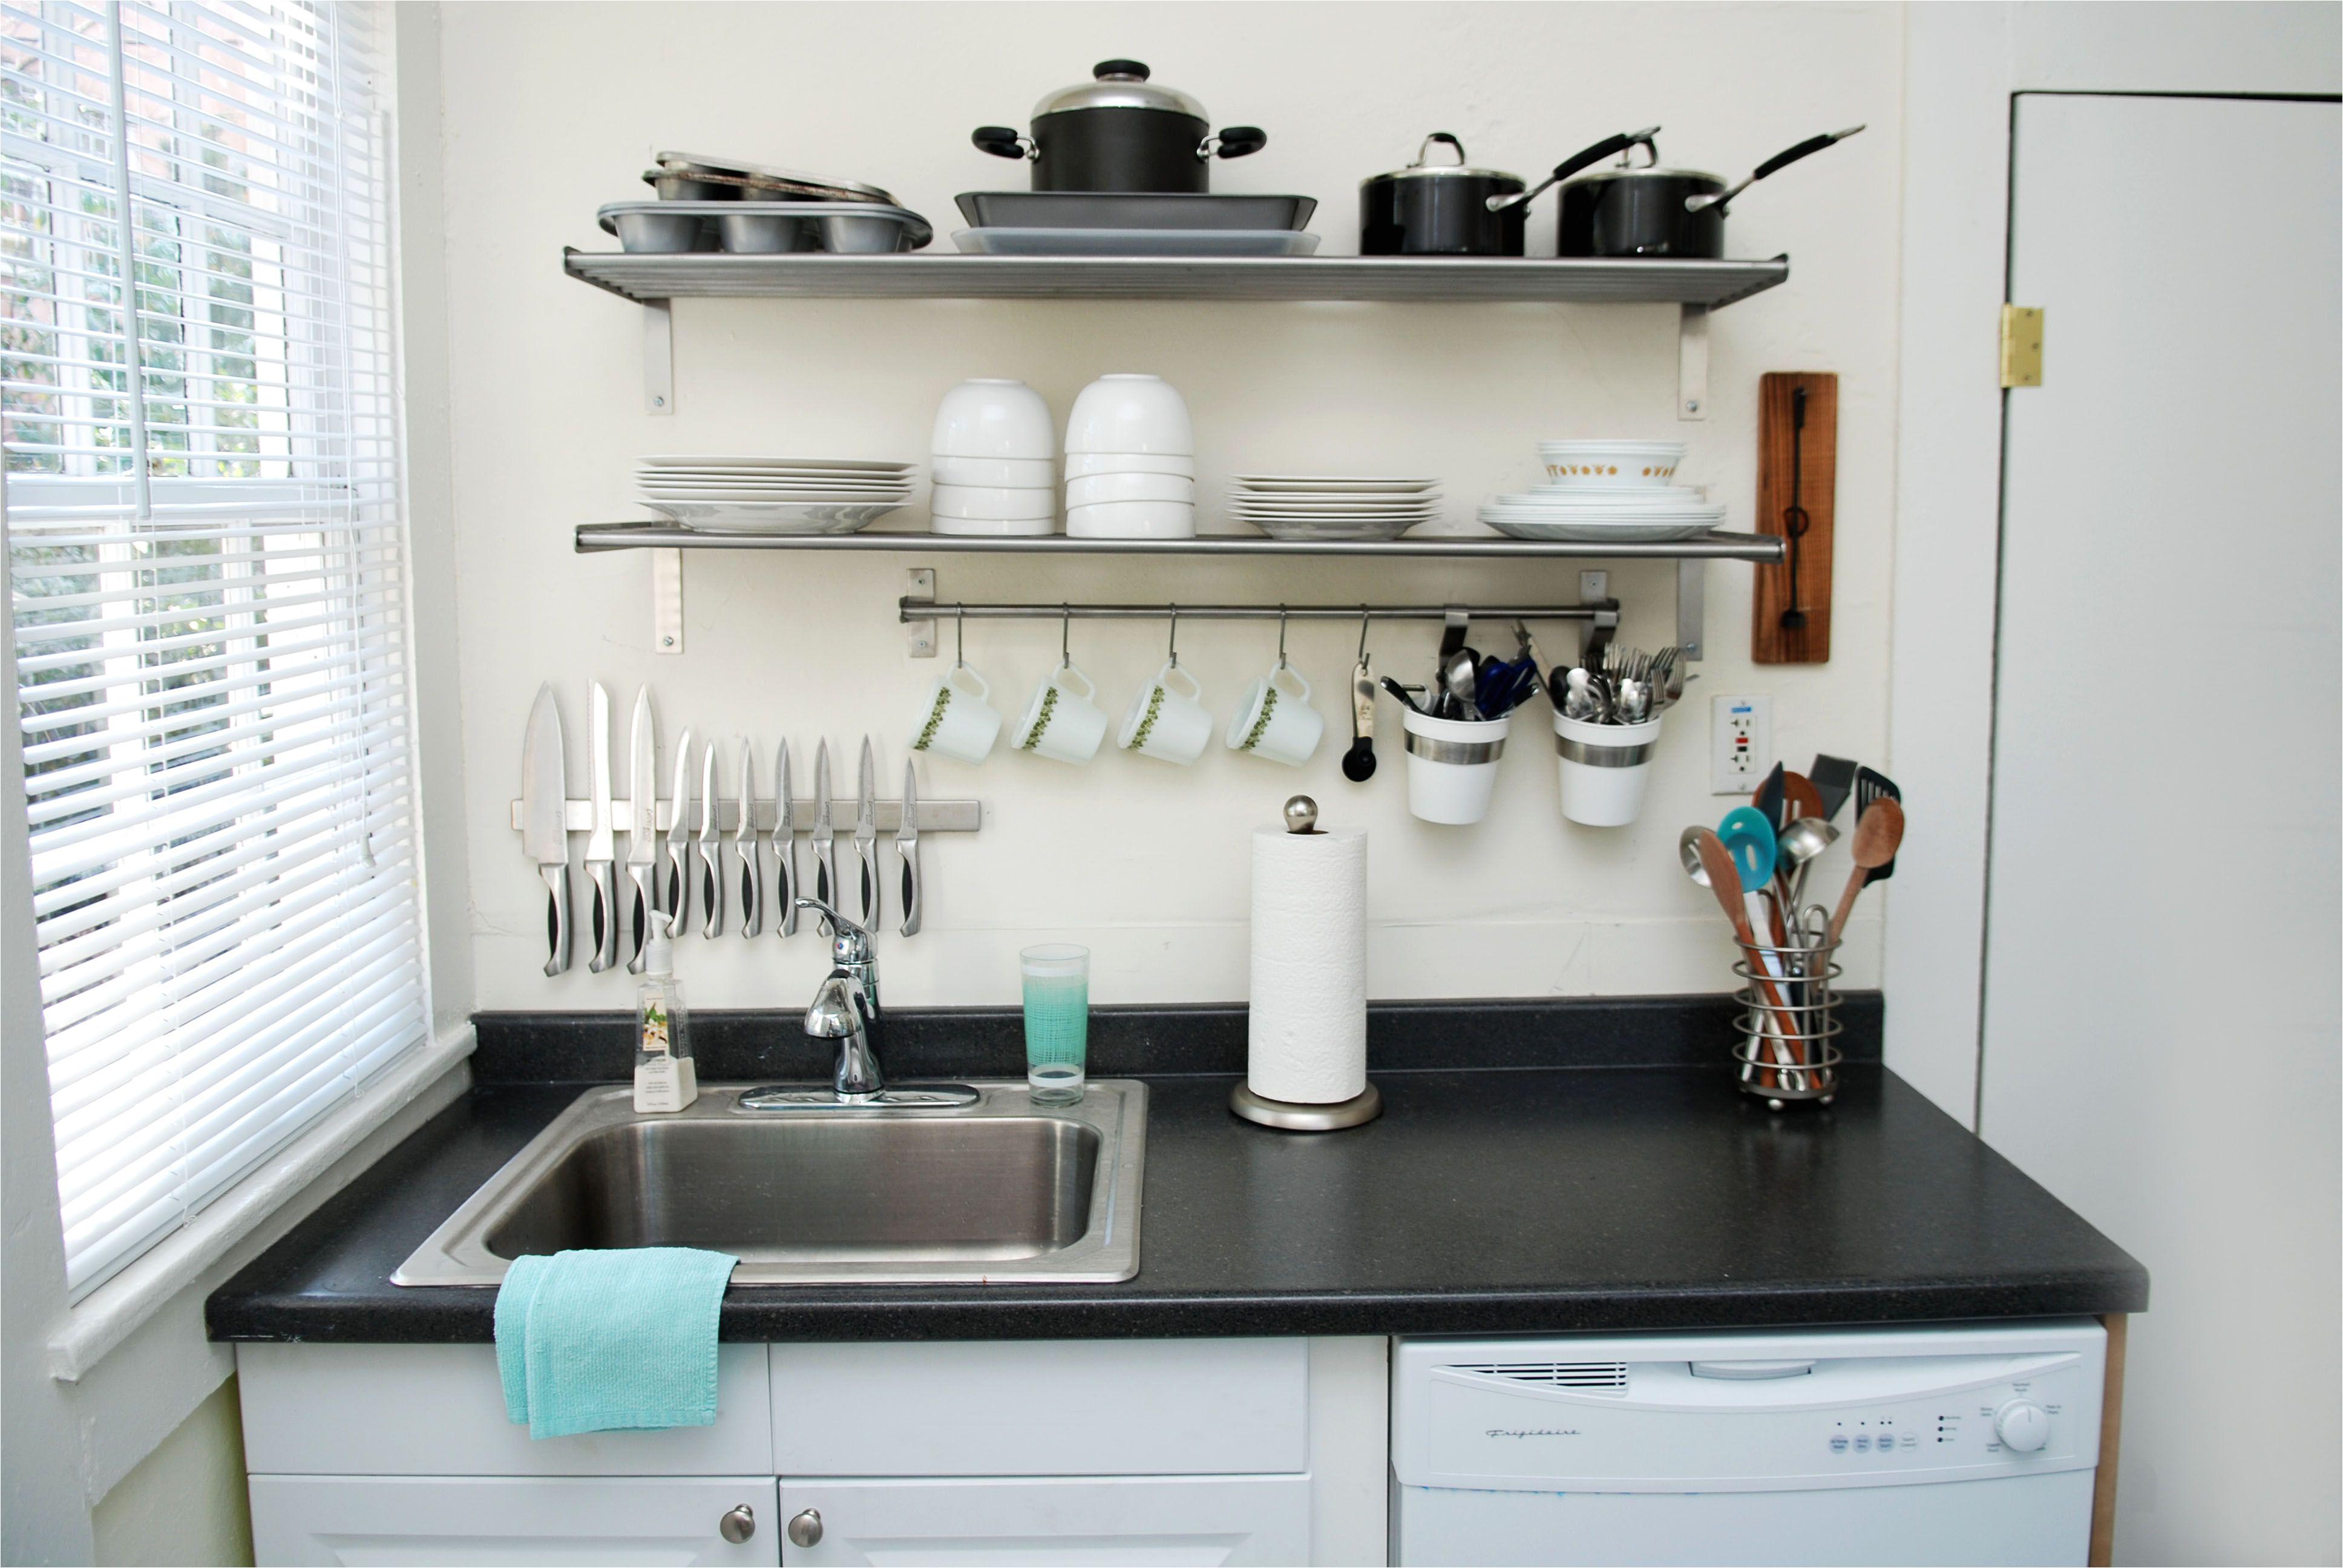 grundtal real world kitchen via smallspaces about com 56a888ec5f9b58b7d0f32041 jpg